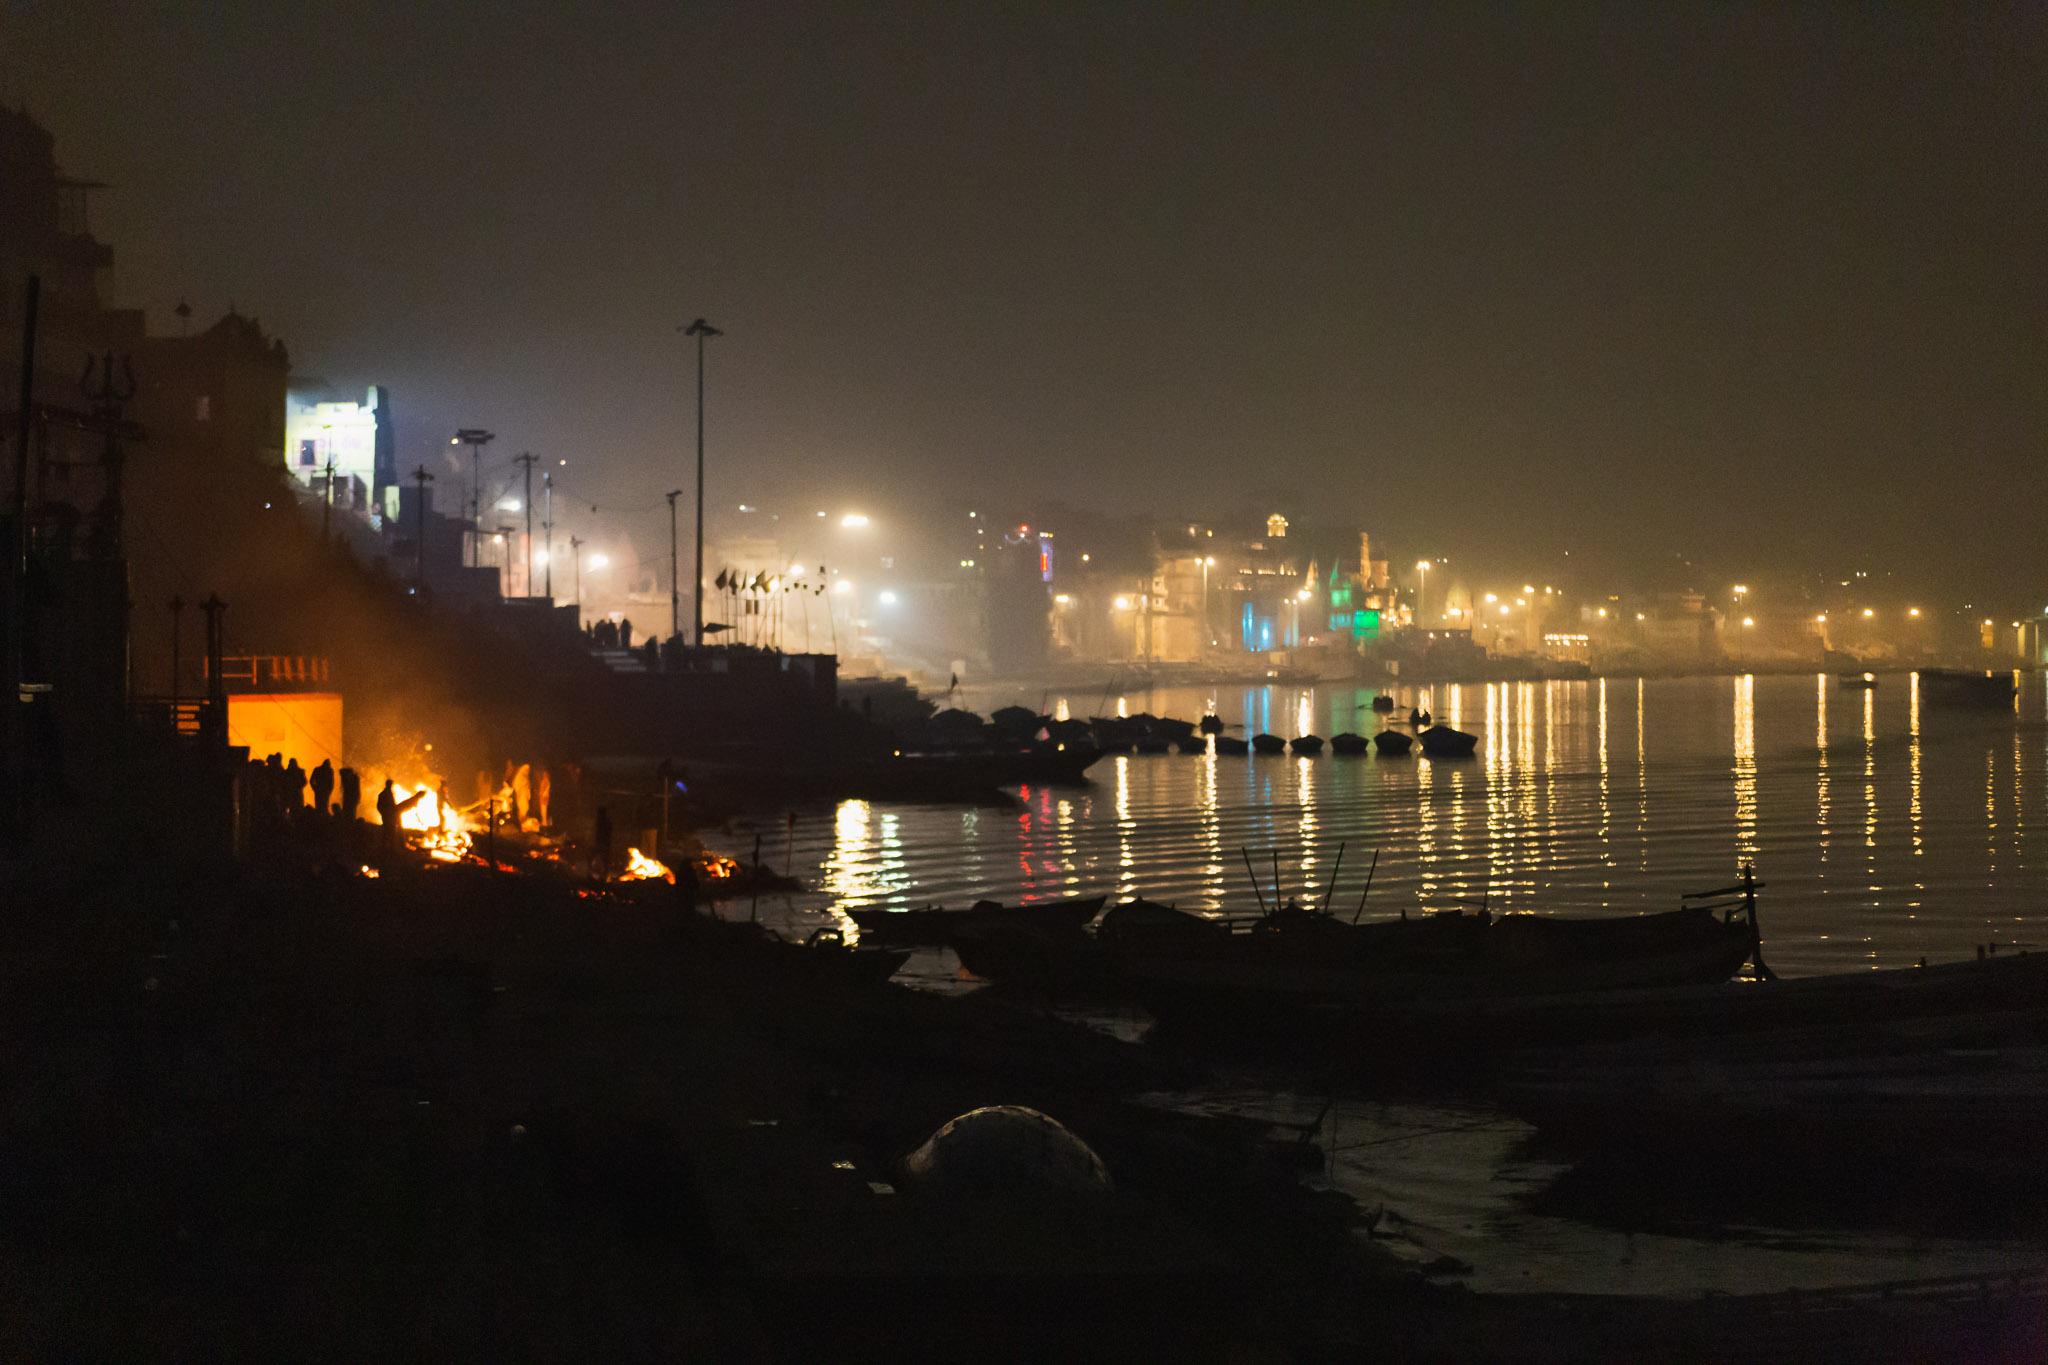 Varanasi city scape at night.